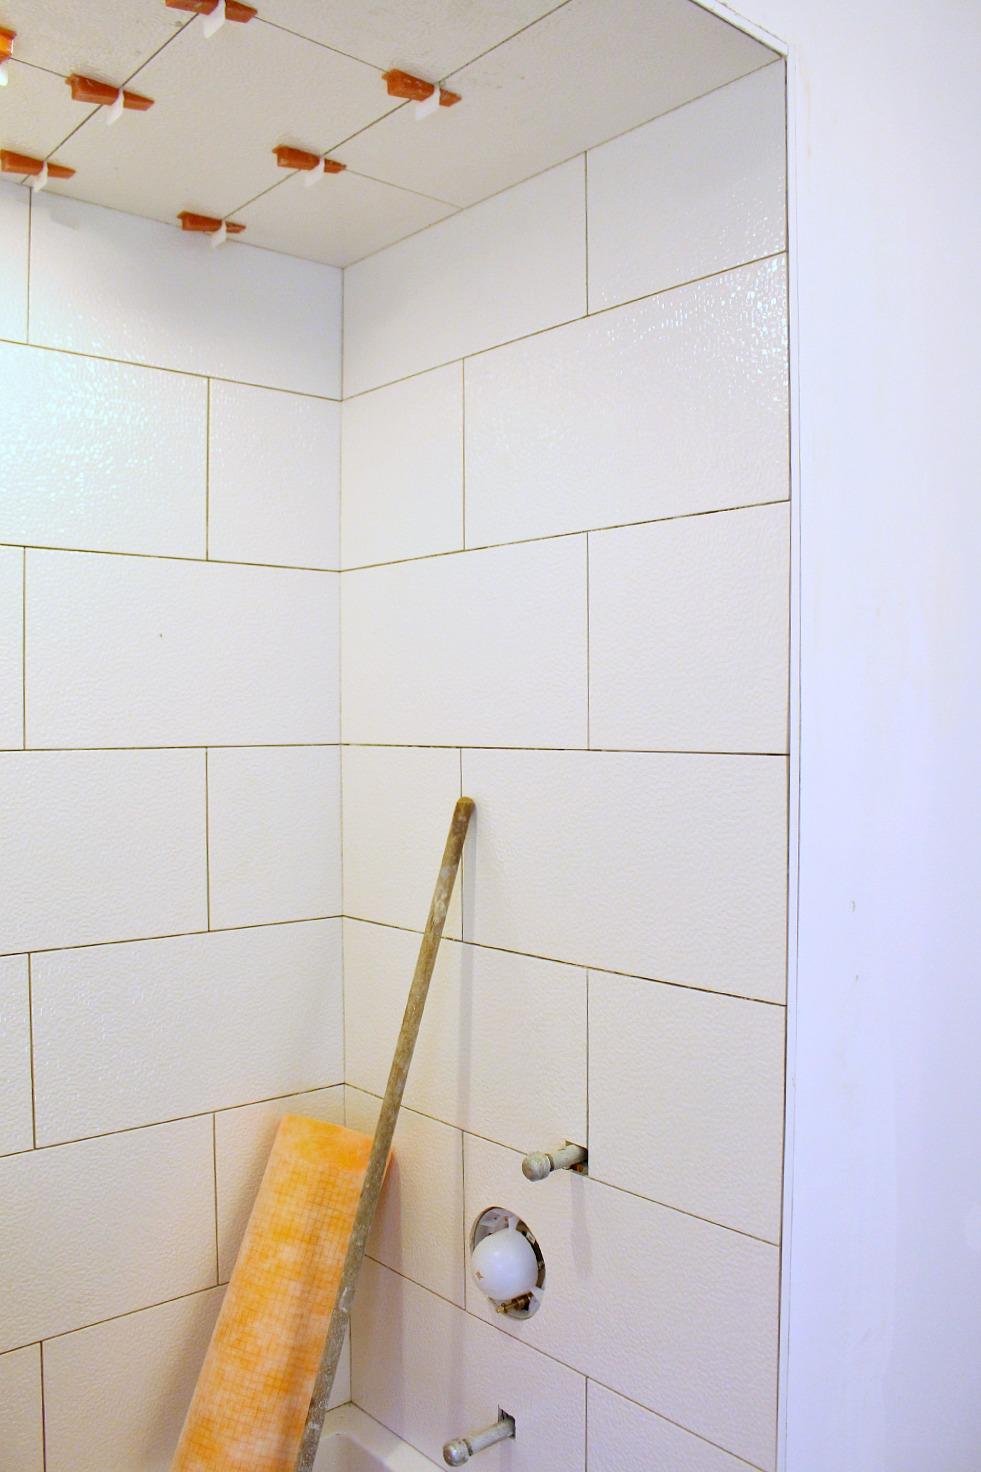 Bathtub surround getting tiled